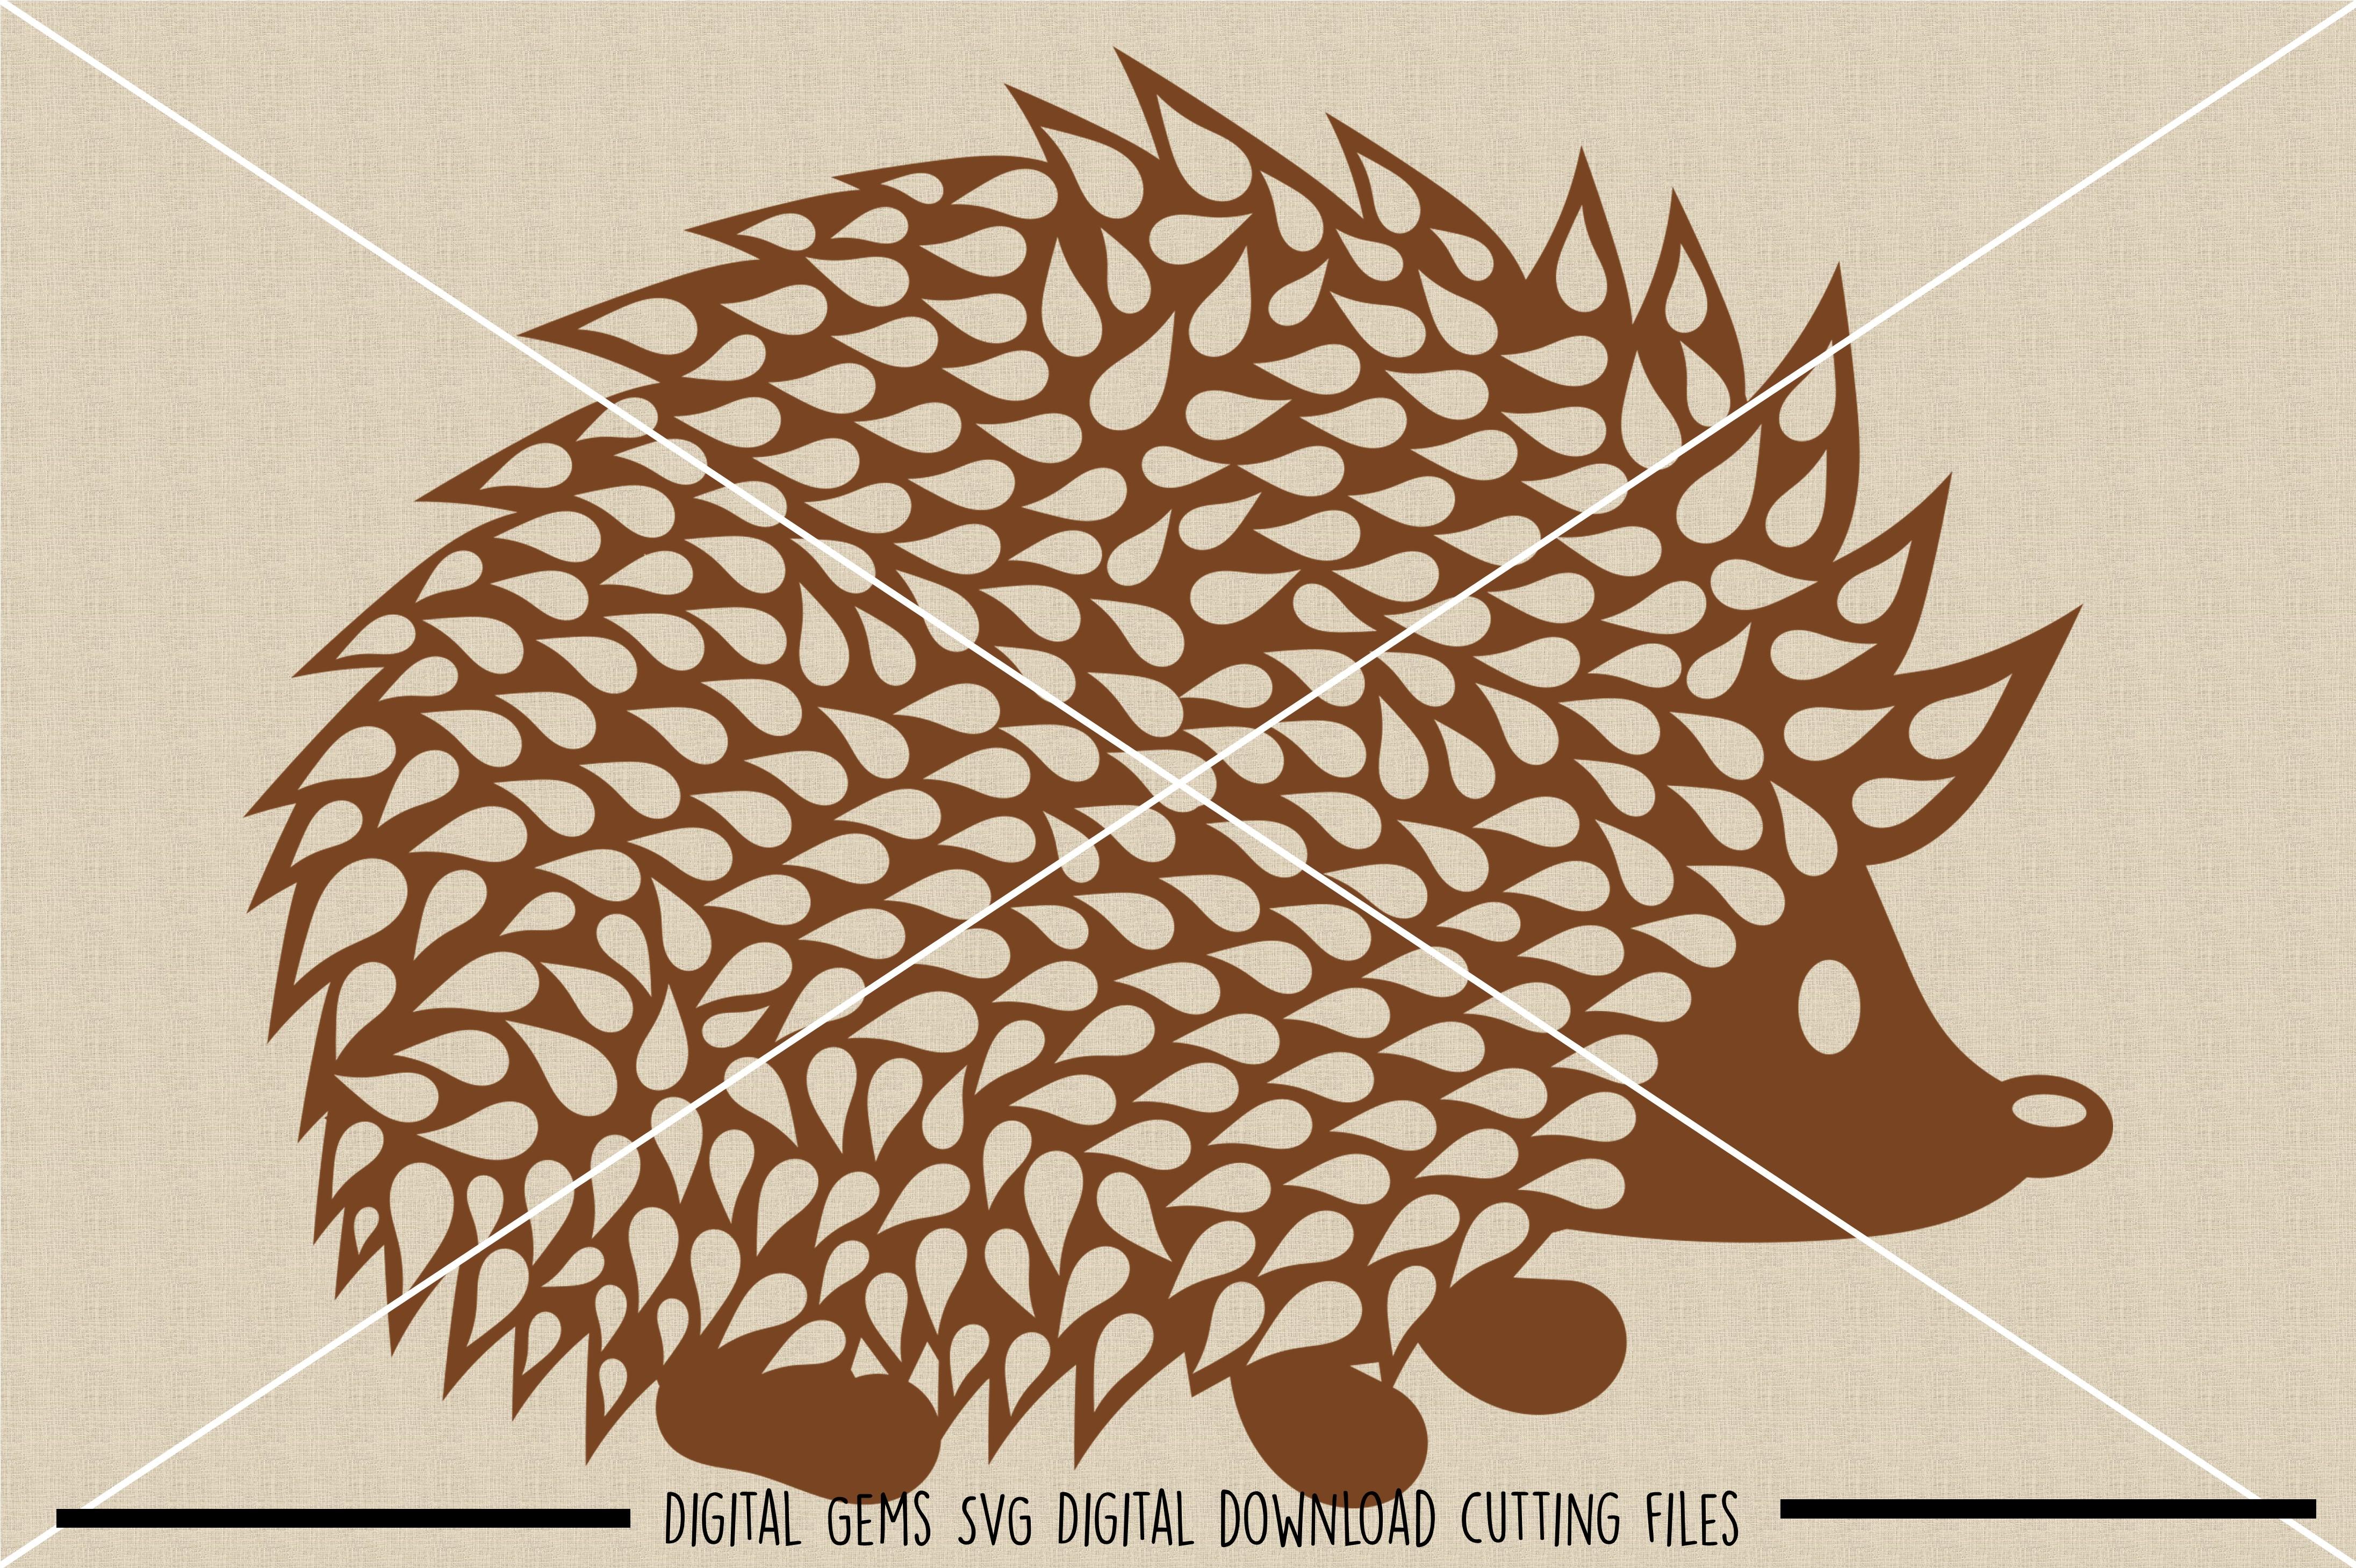 Hedgehog SVG / DXF / EPS / PNG files example image 2